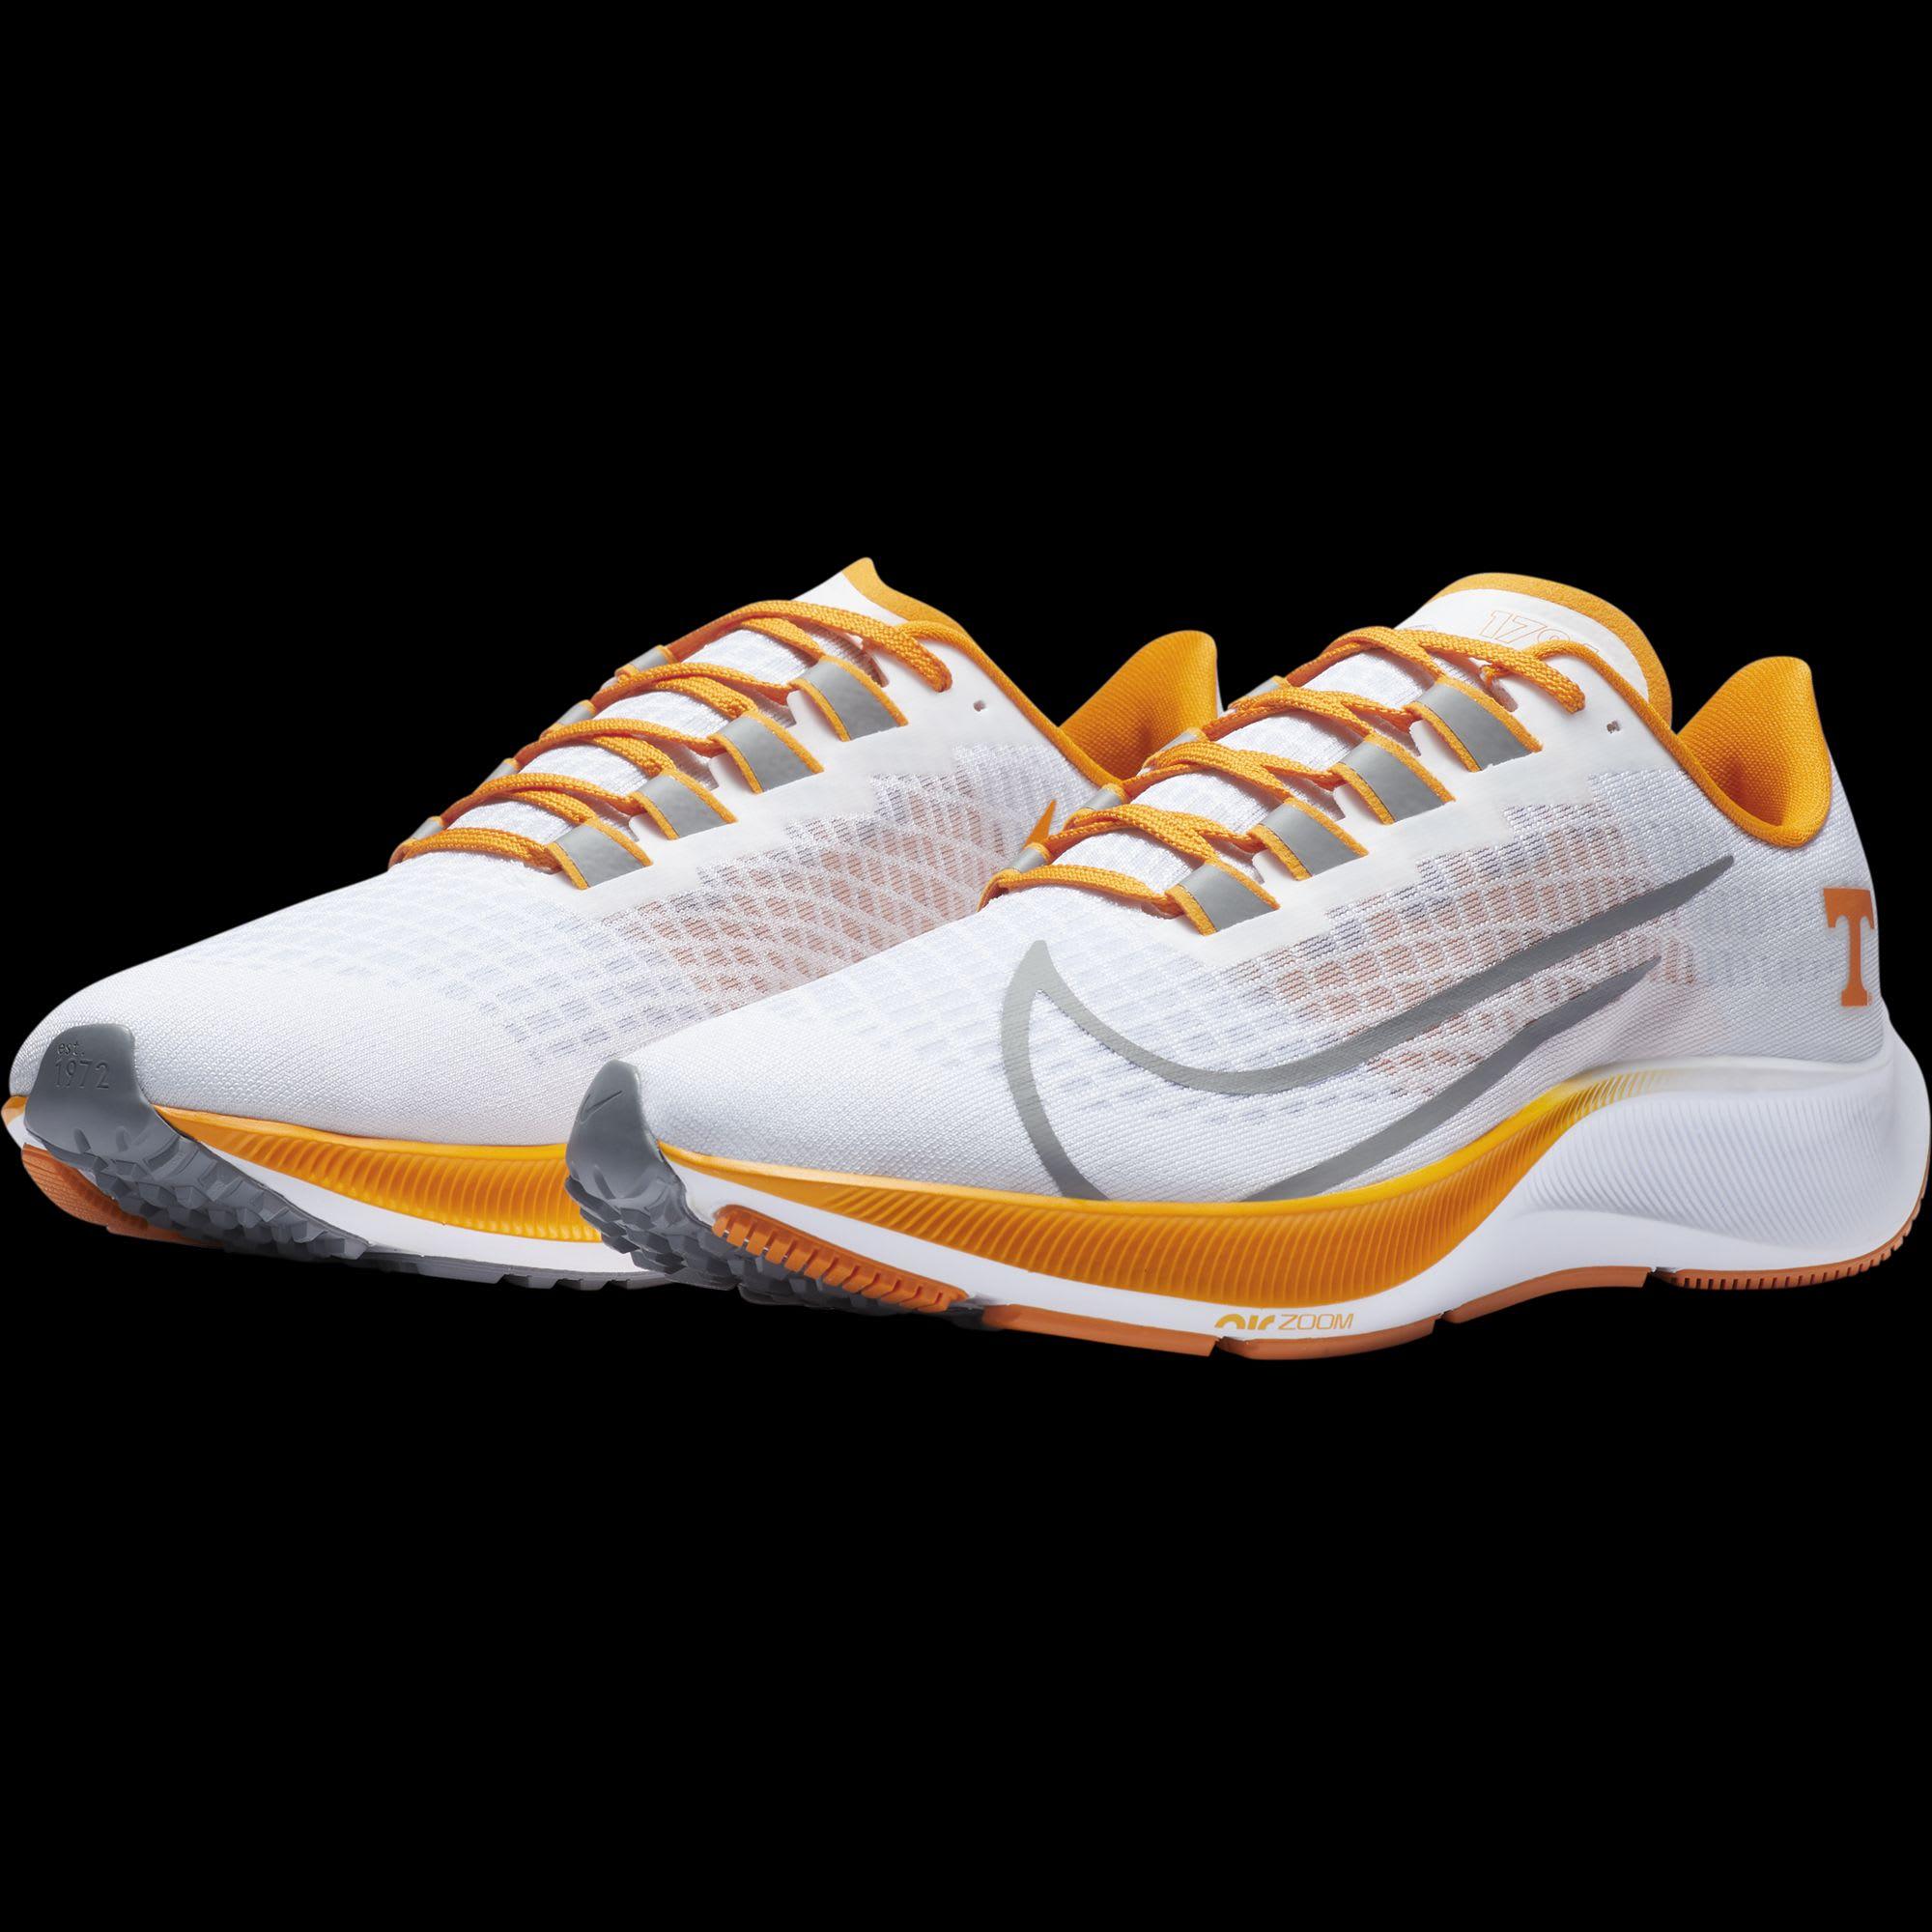 The Nike Air Zoom Pegasus 37 Tennessee